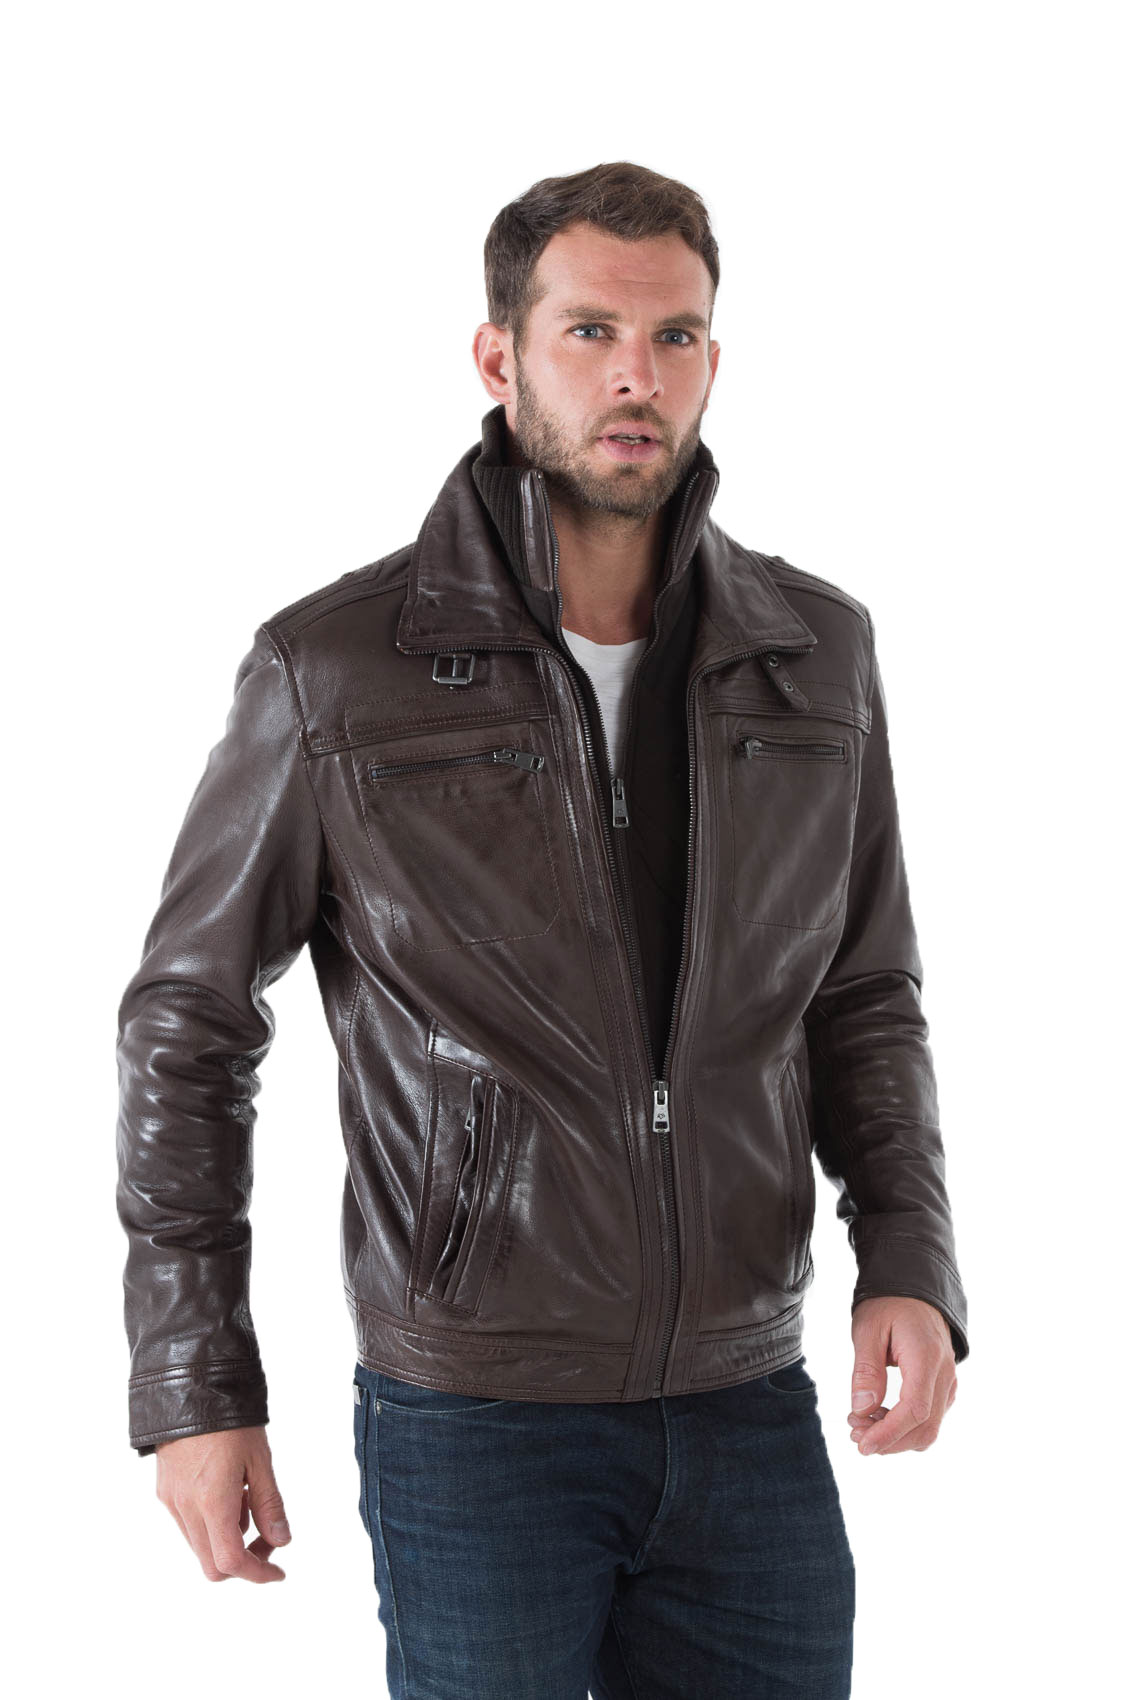 Porter une veste en cuir marron homme